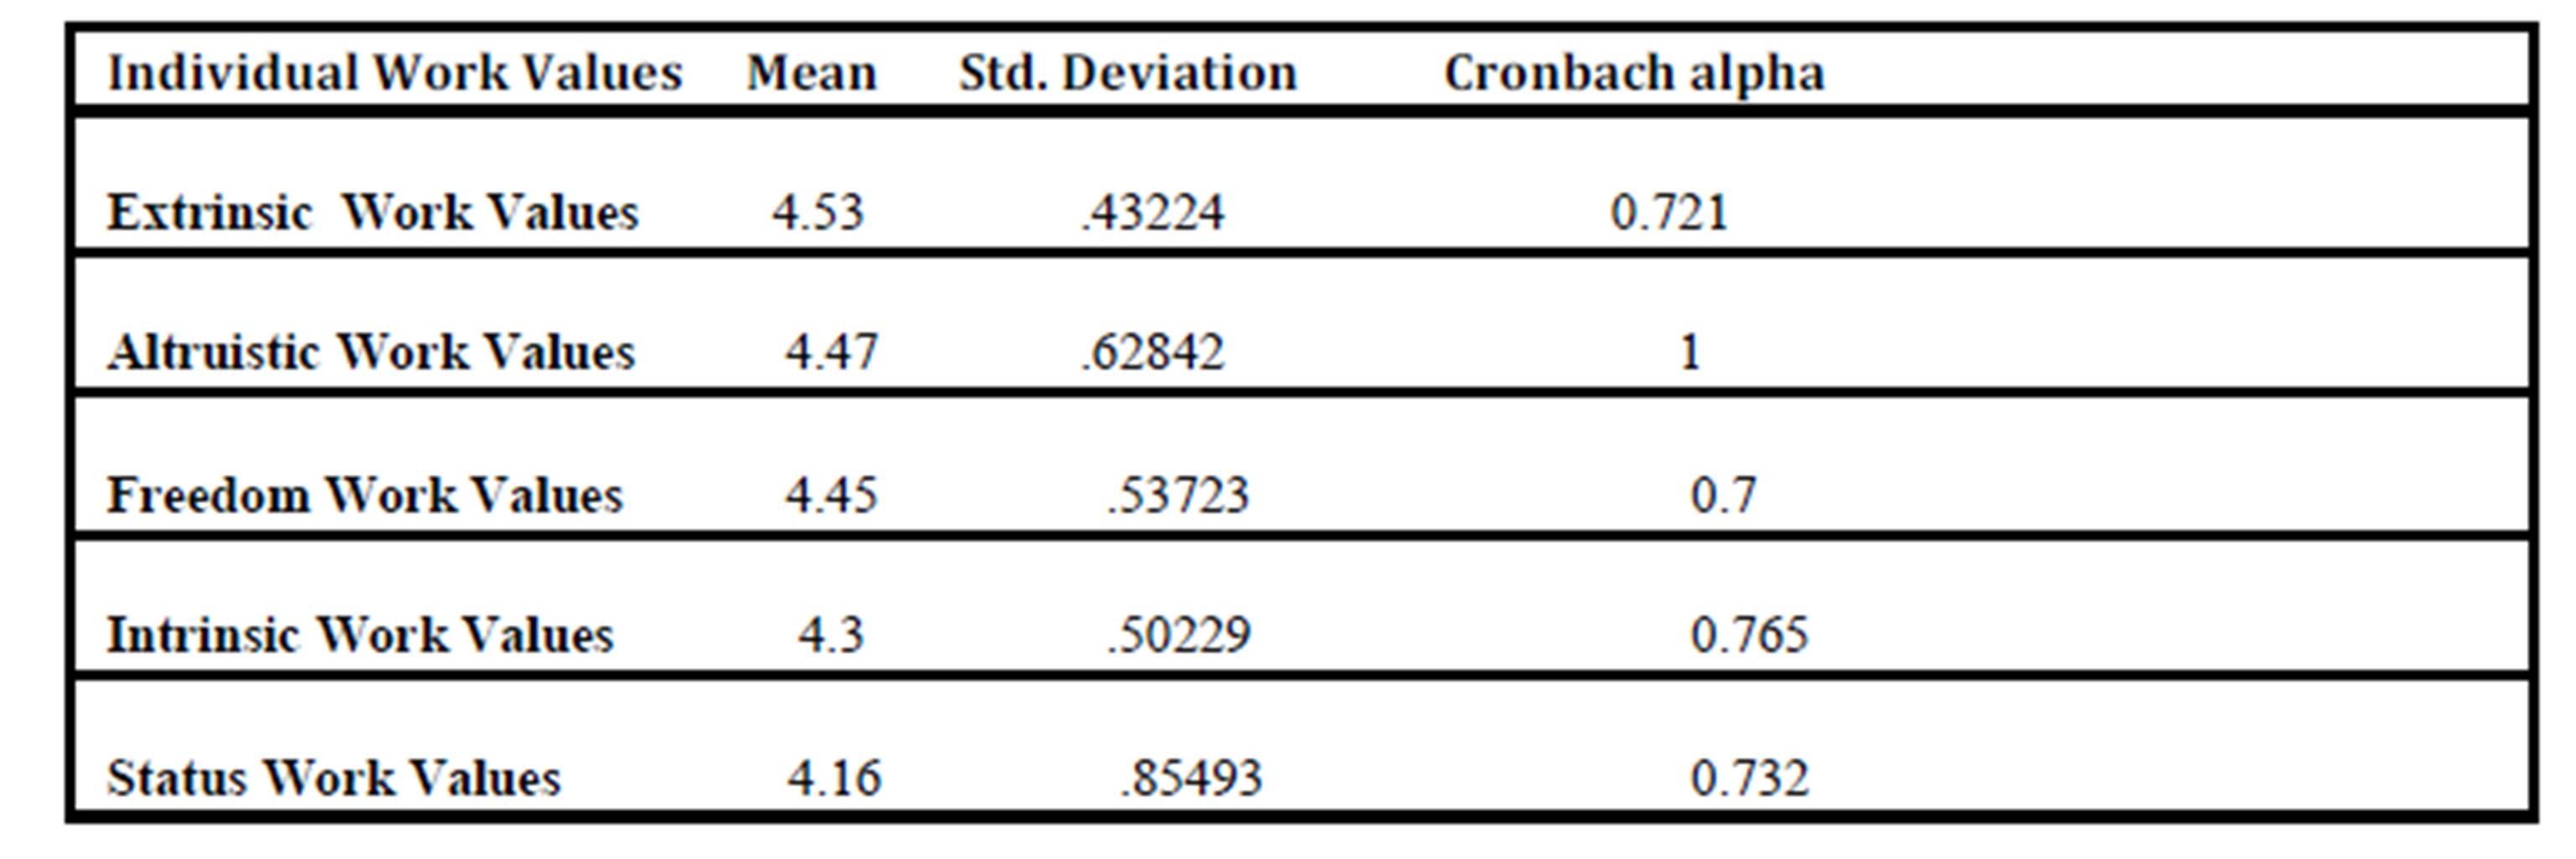 partition values in statistics pdf